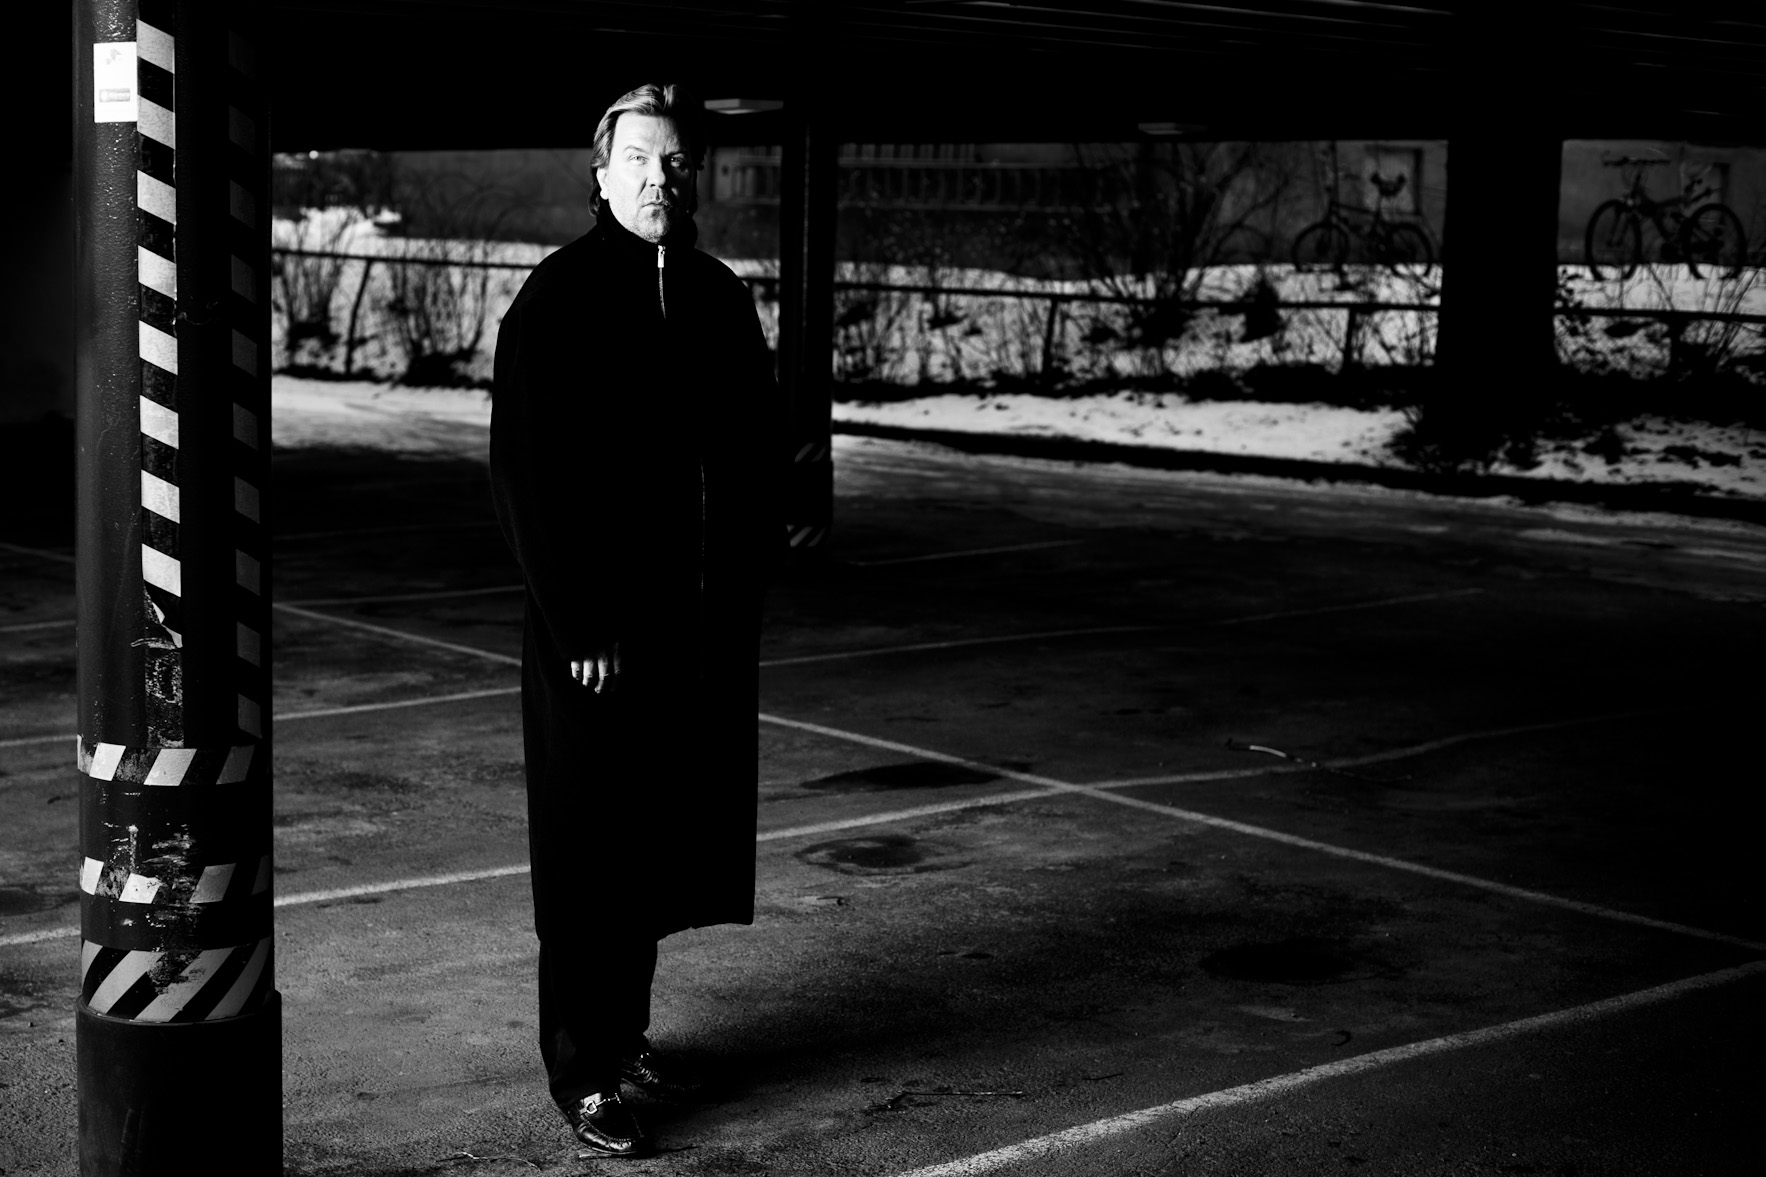 Conductor Ari Rasilainen